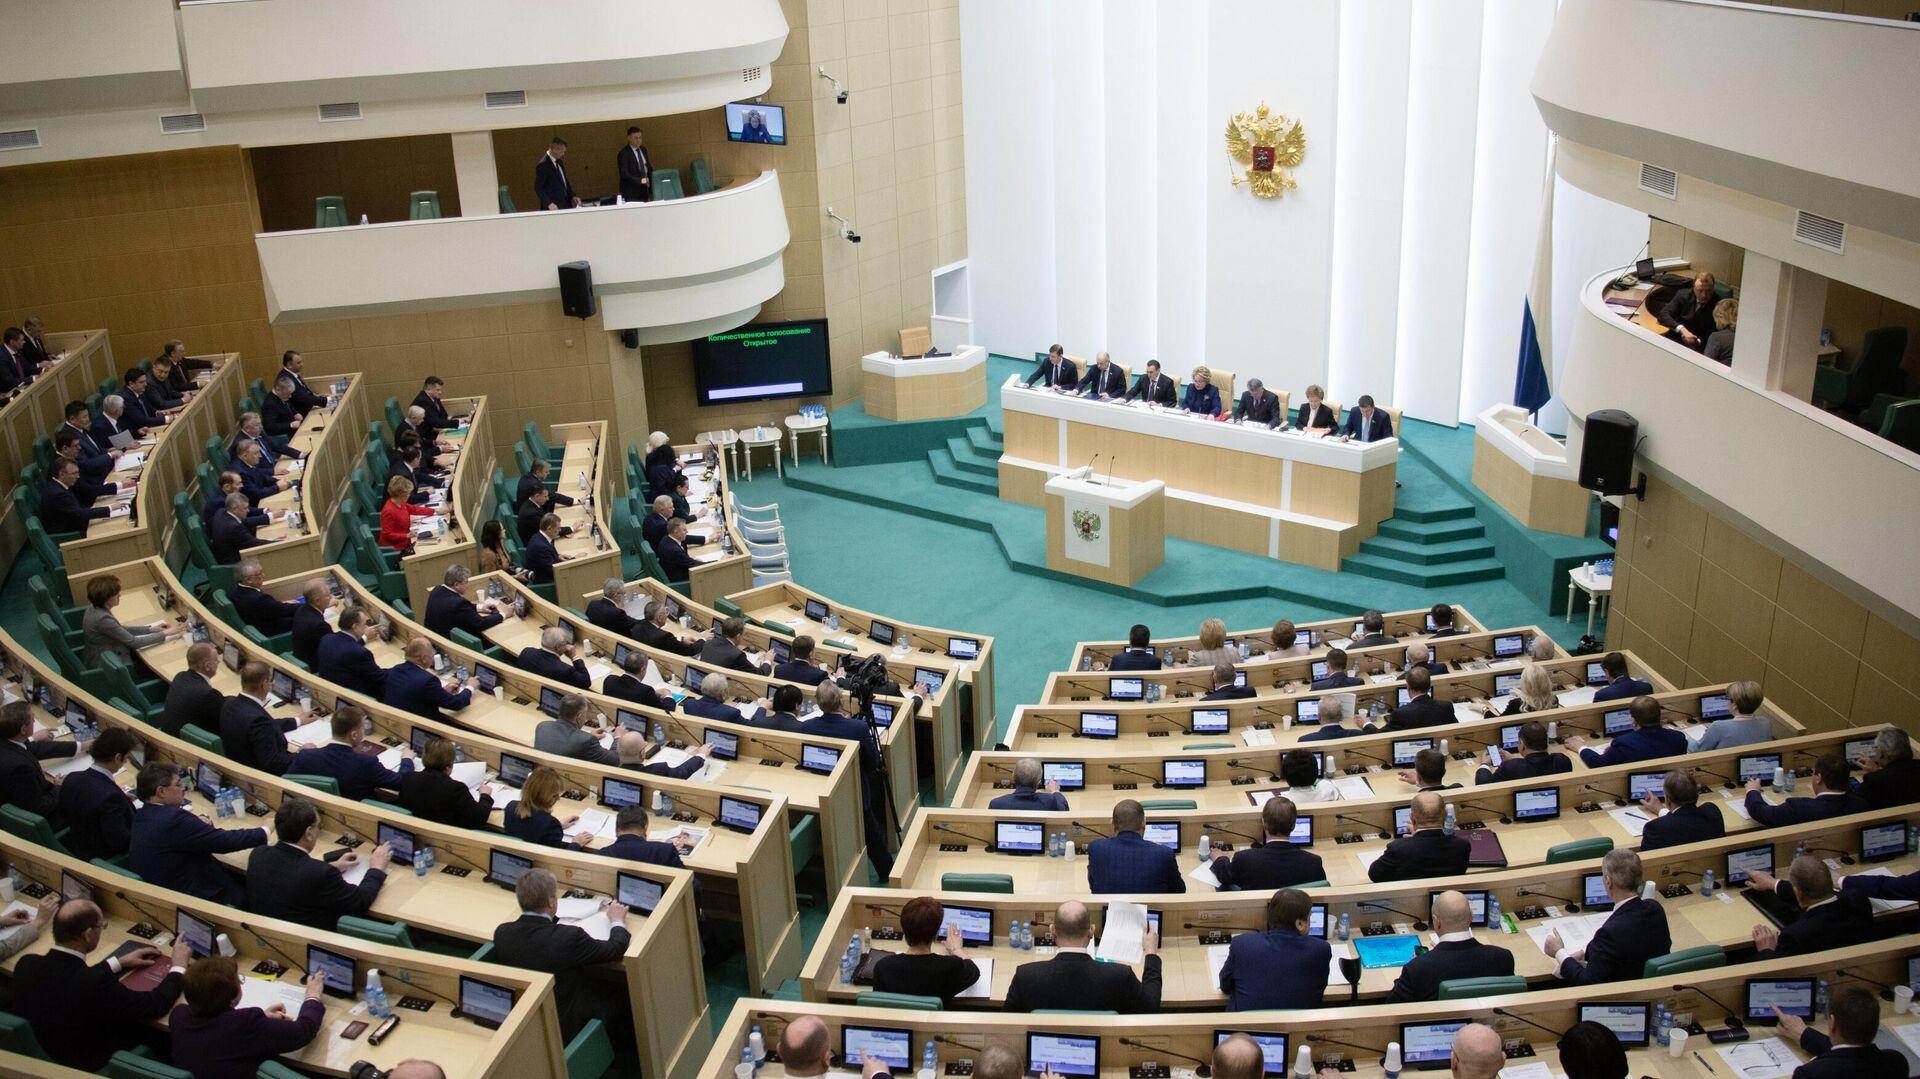 Заседание Совета Федерации РФ - РИА Новости, 1920, 16.09.2020